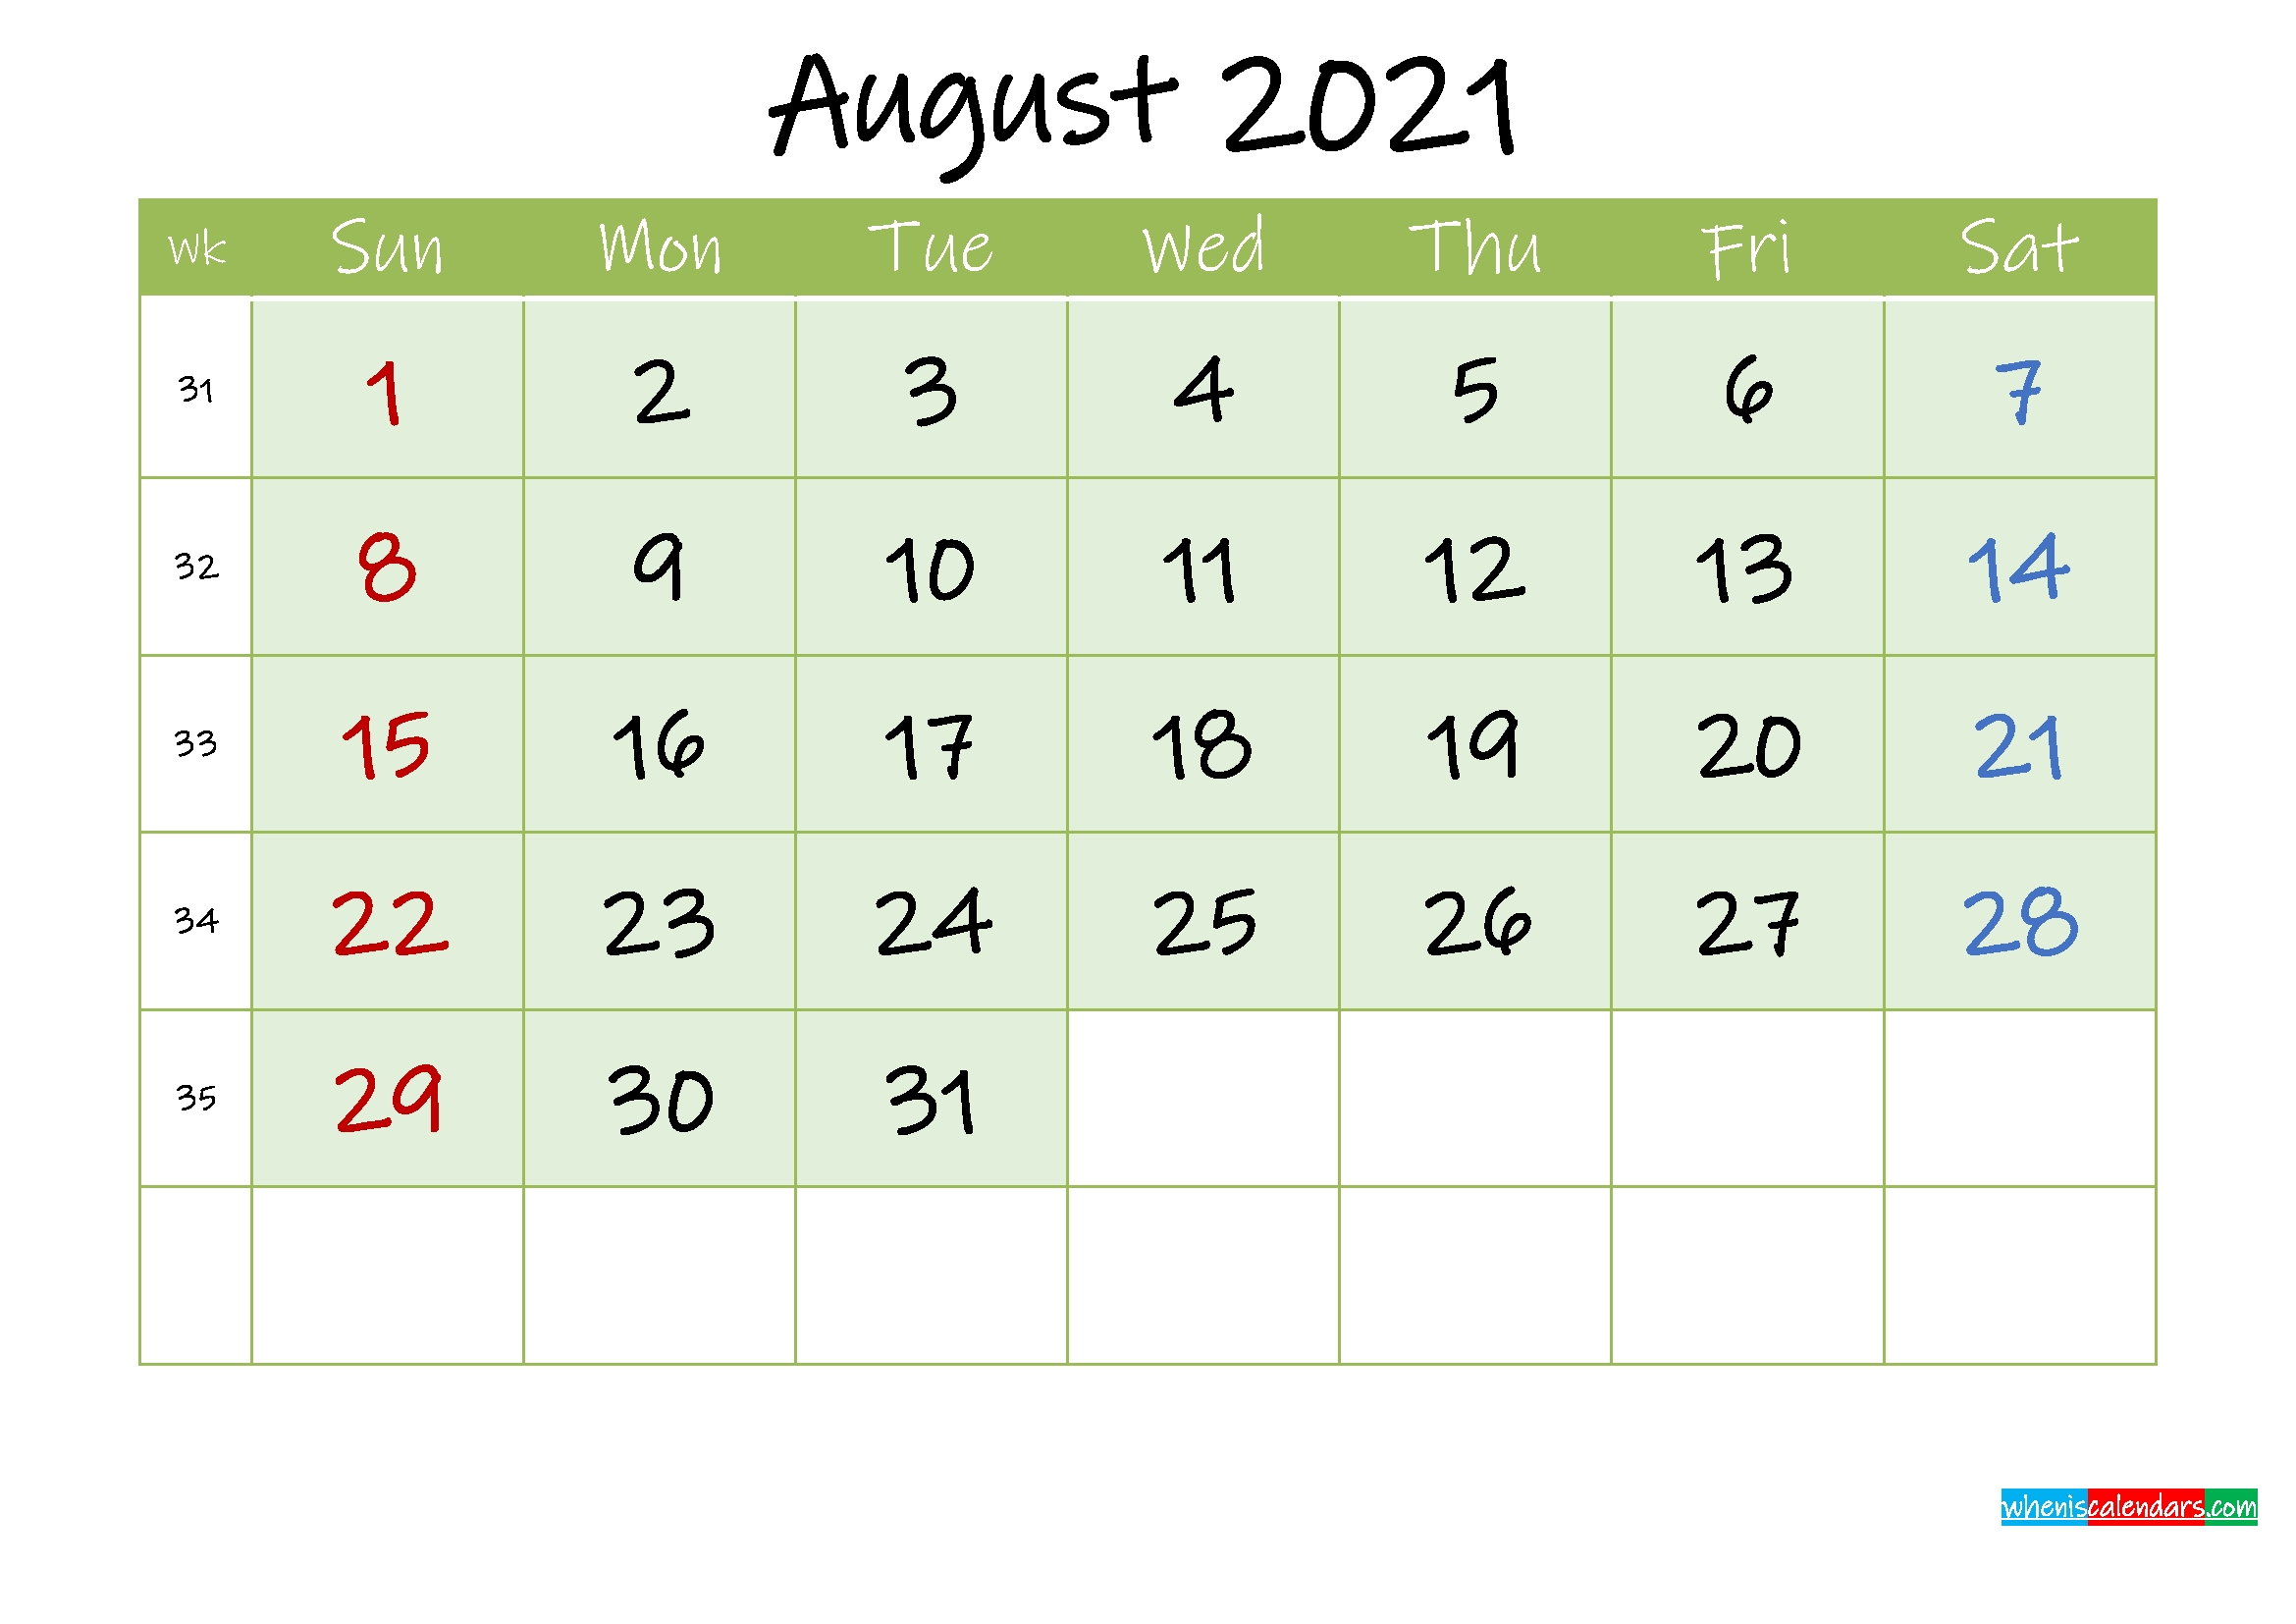 August 2021 Free Printable Calendar - Template Ink21M128   Free Printable 2020 Calendar With August 2021 Jewish Calendar